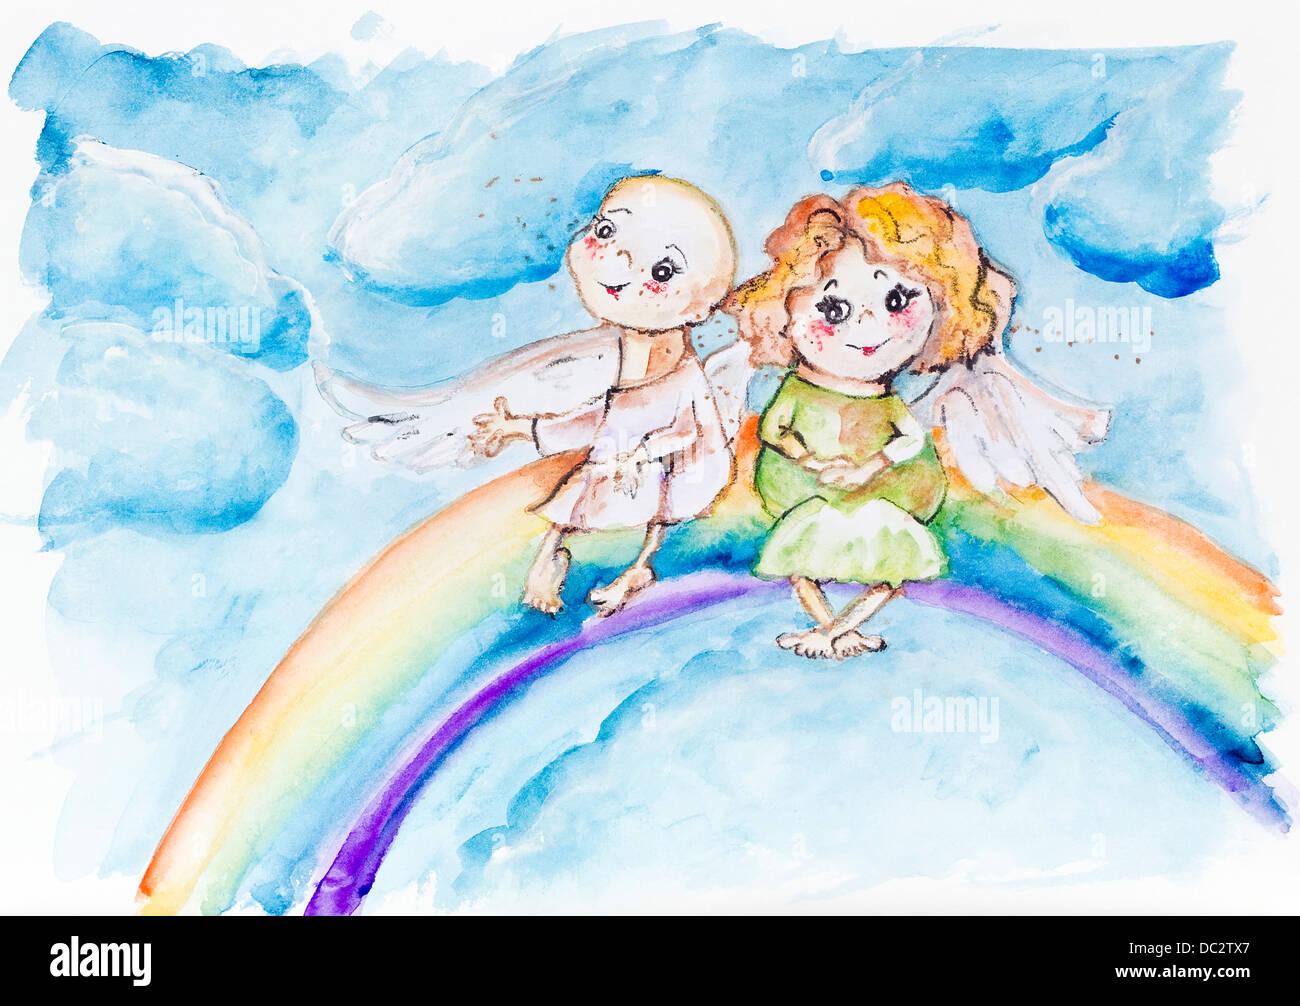 Gracioso Arco Iris ángeles Niños En Concepto De Cielo Pintura